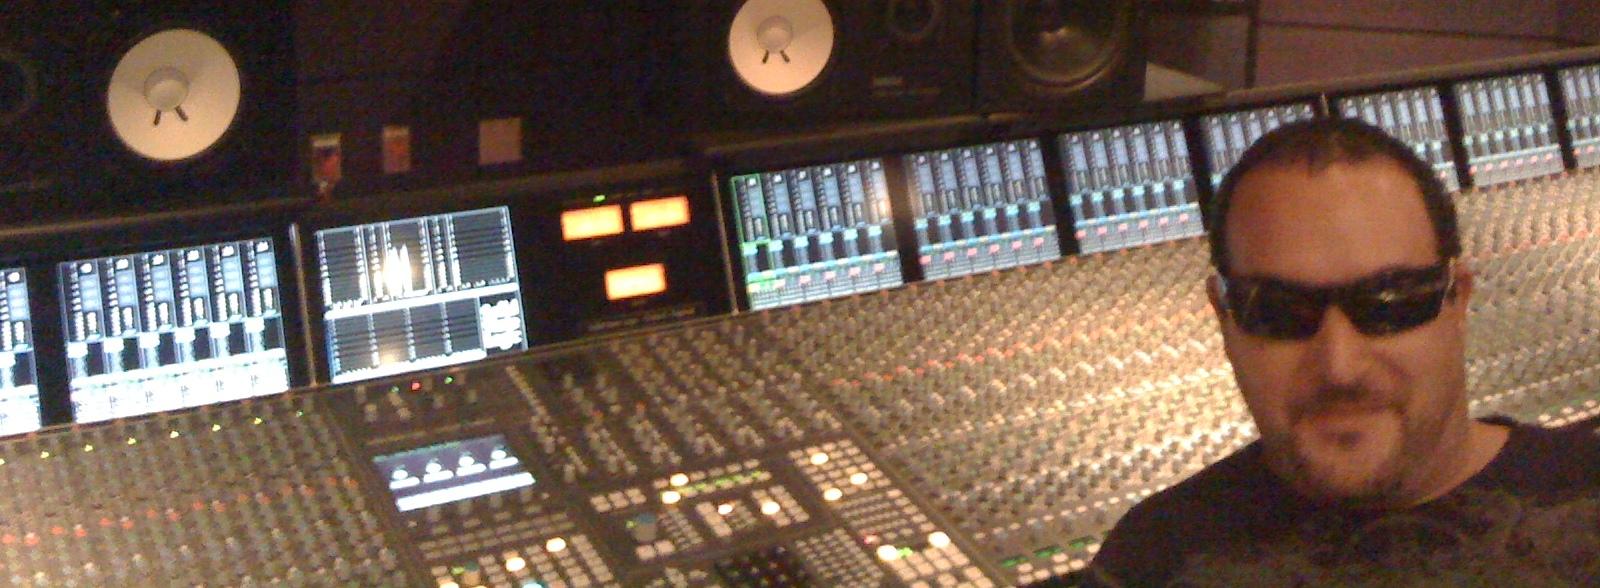 Tony_at_odds_on_studios_in_las_vegas